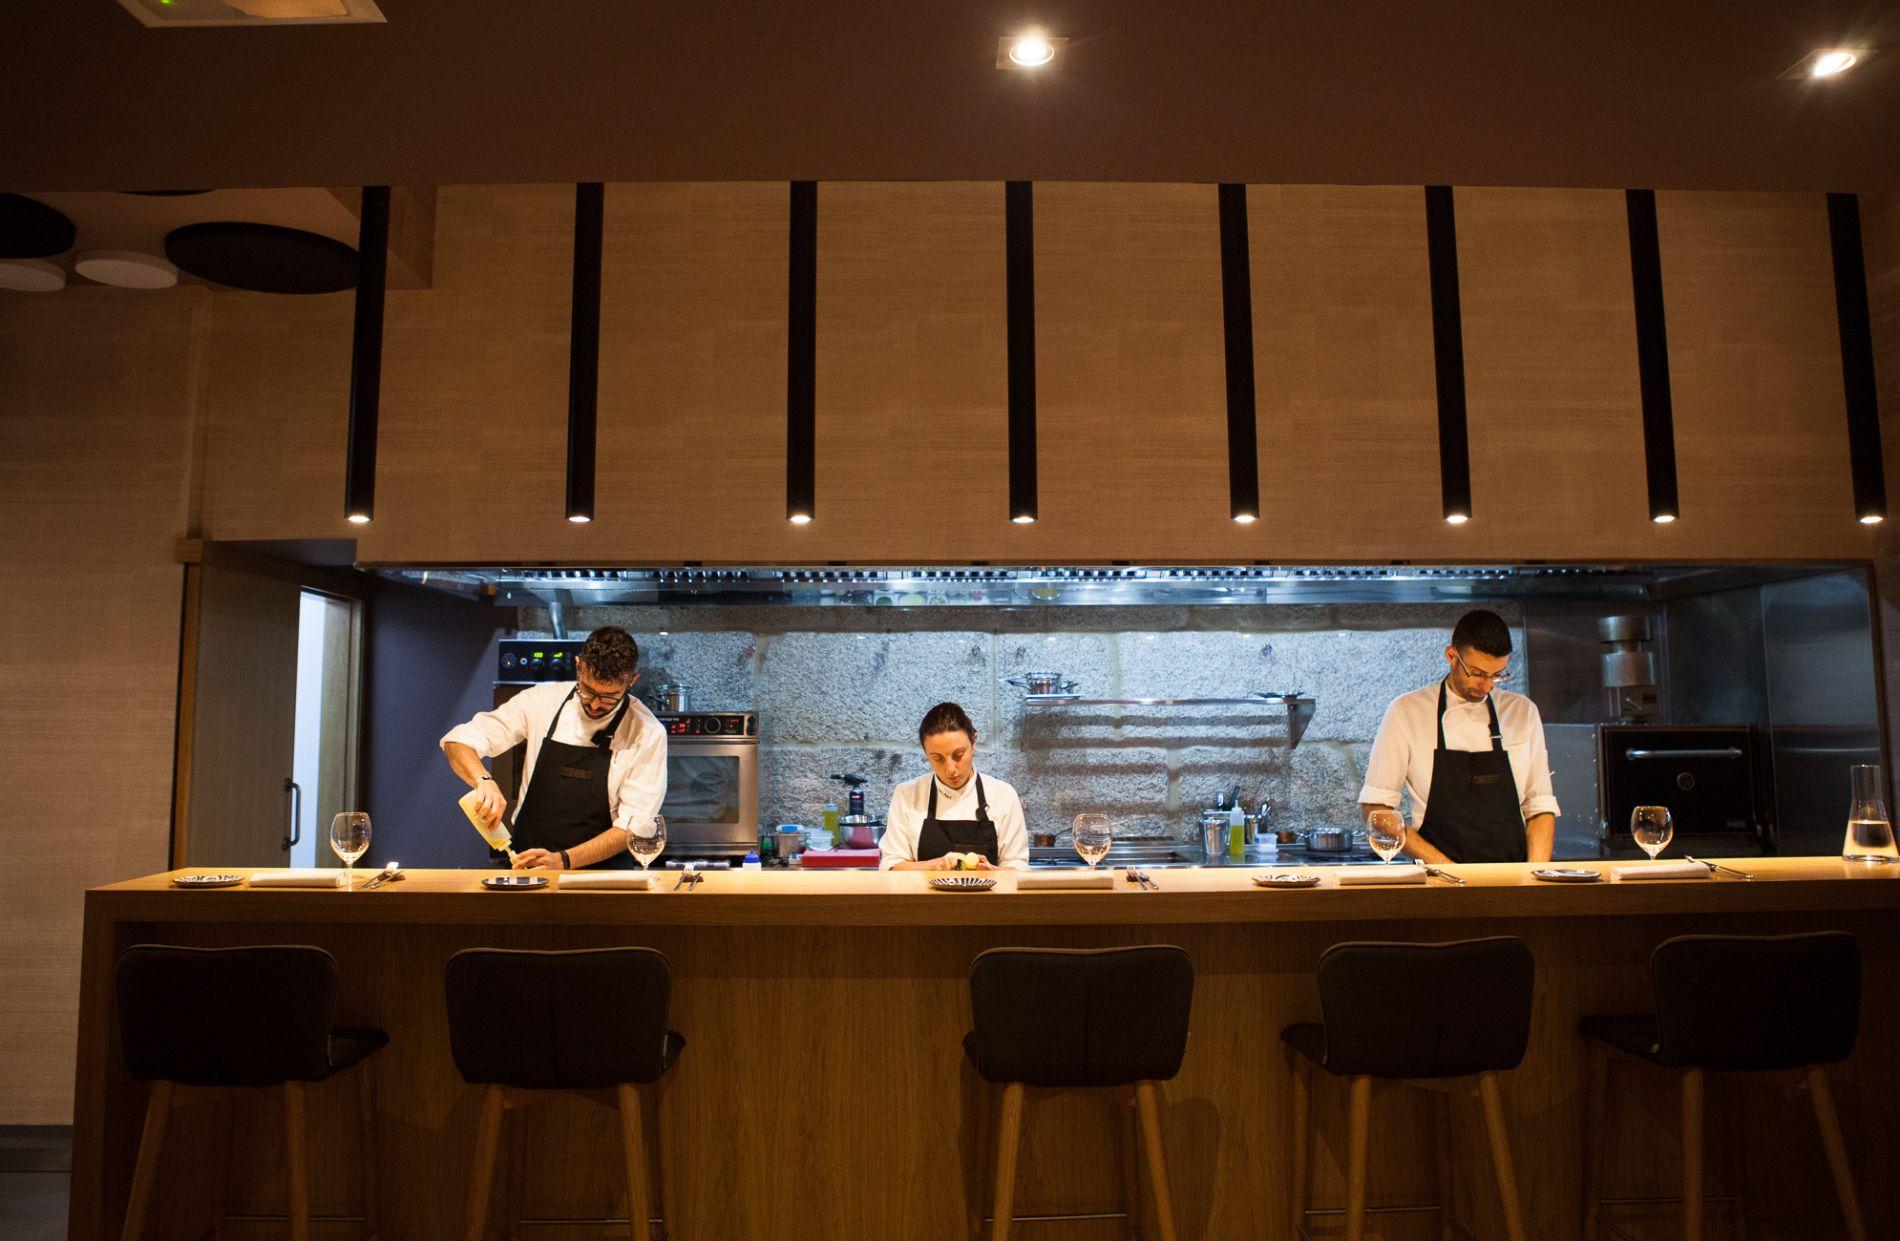 Restaurante 'Maruja Limón': barra con vistas a la cocina